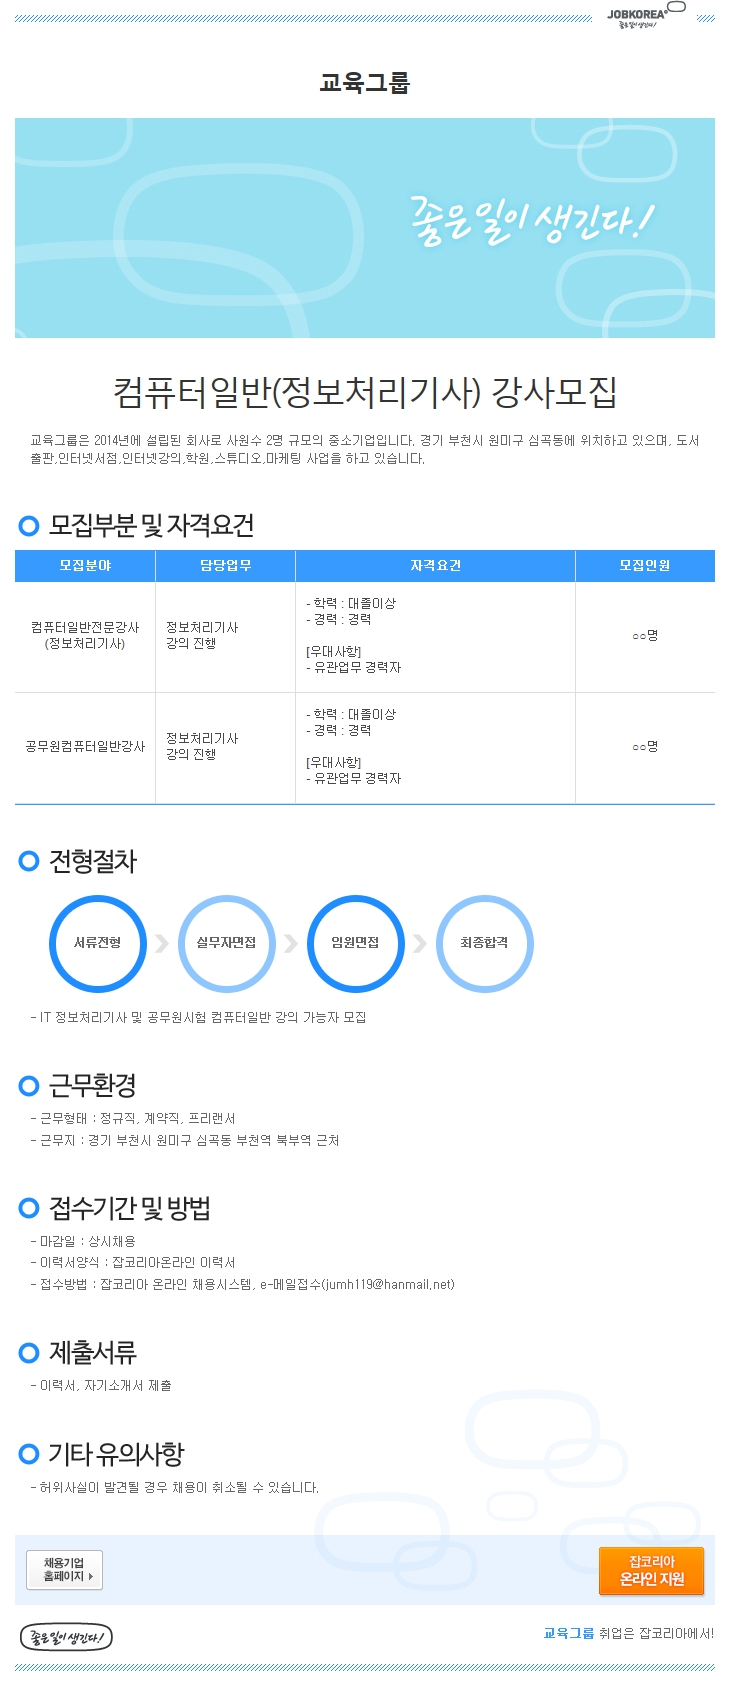 jobkorea_co_kr_20151209_132321.jpg